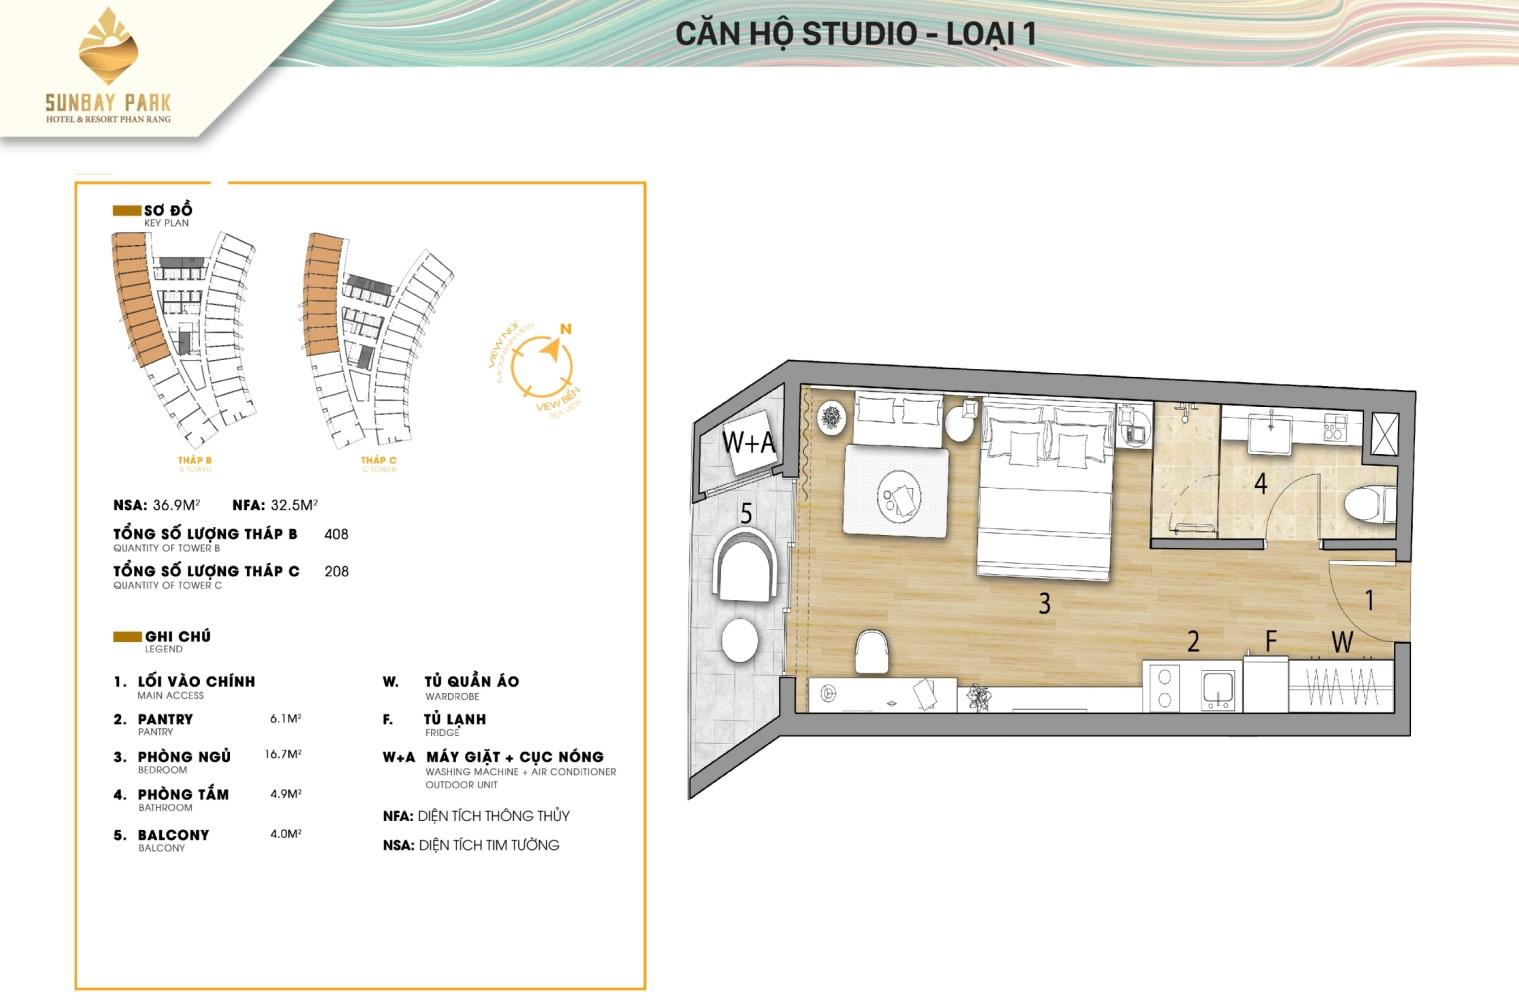 căn hộ studio sunbay park